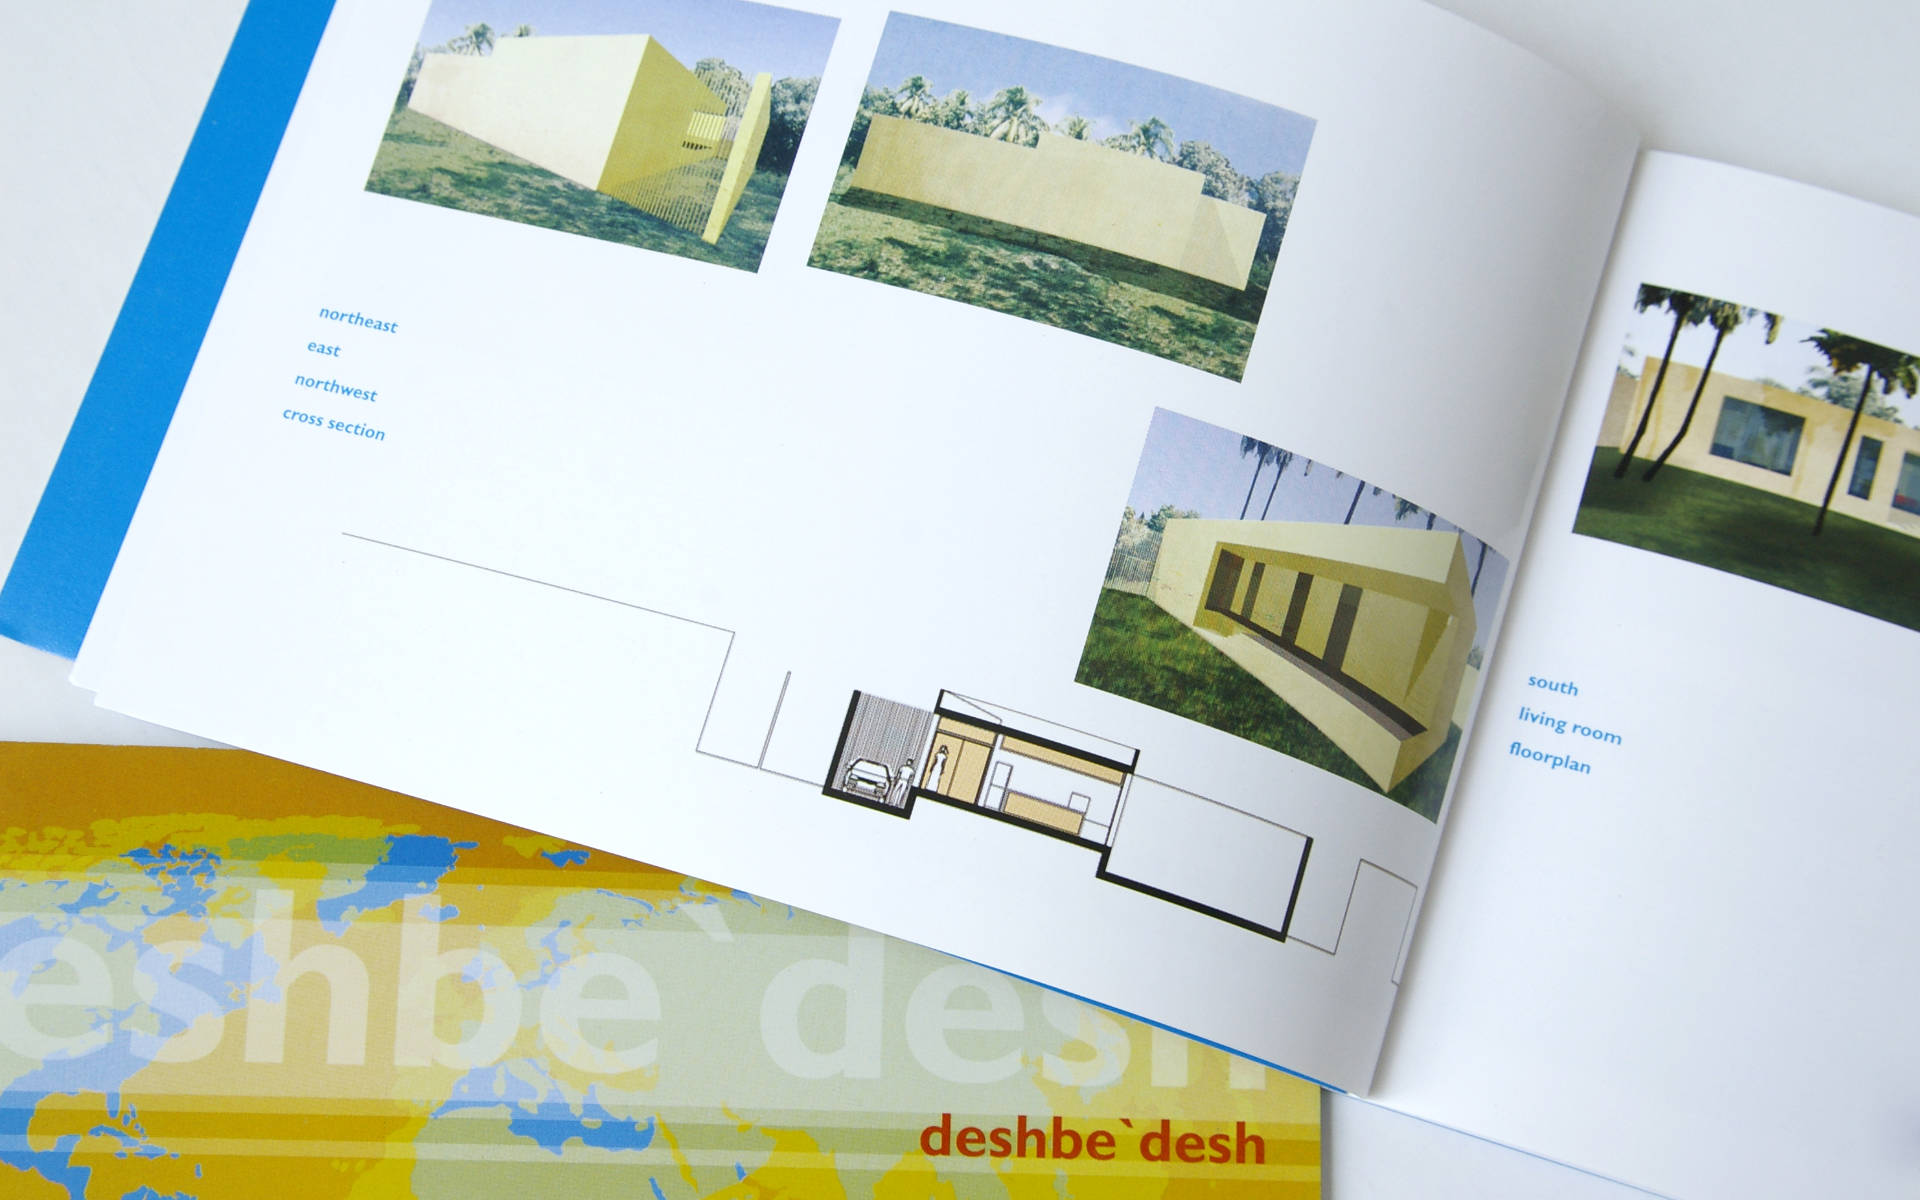 Deshbedesh Ausstellungskatalog Design Berlin